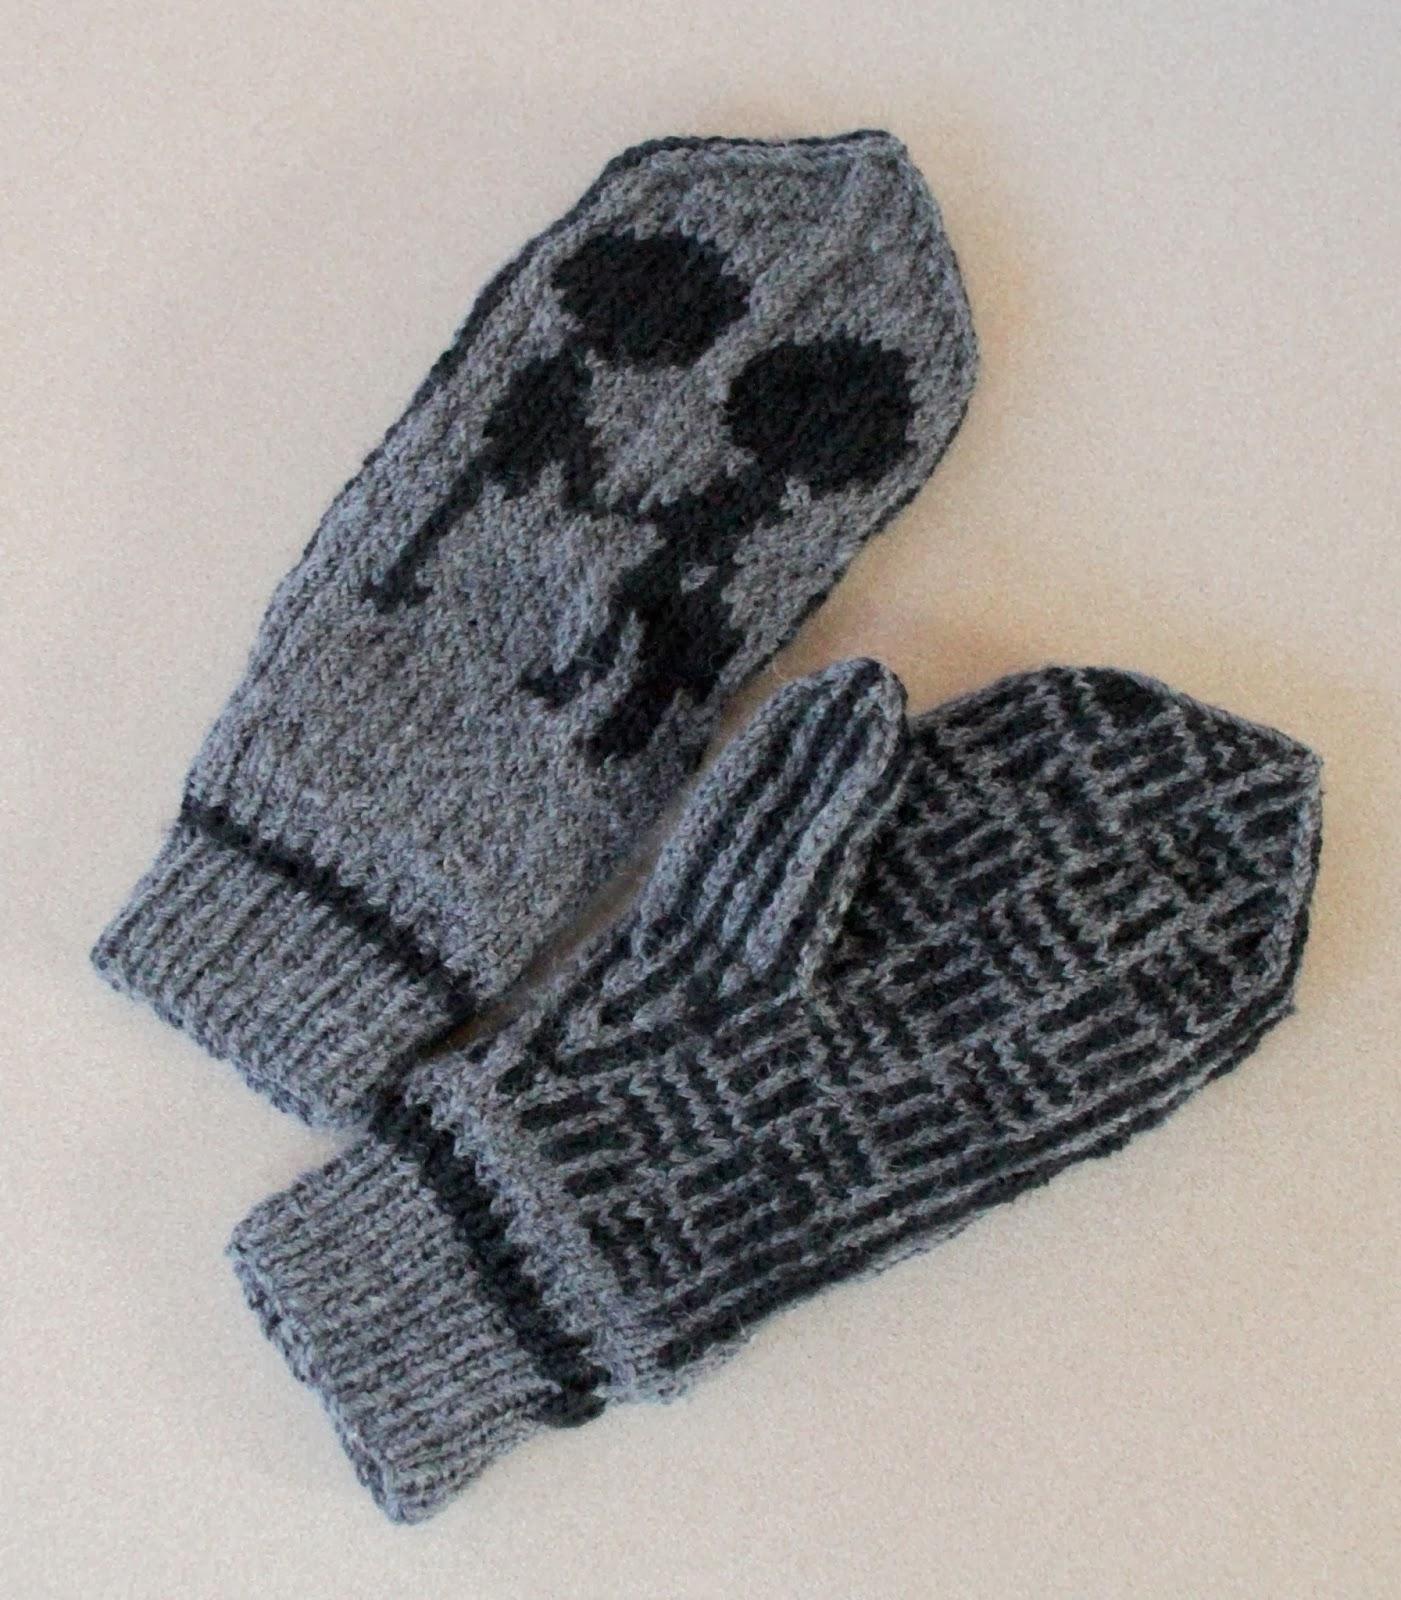 Knitting Pattern For Gloves Best Of Radiohead Mittens Knitting Pattern